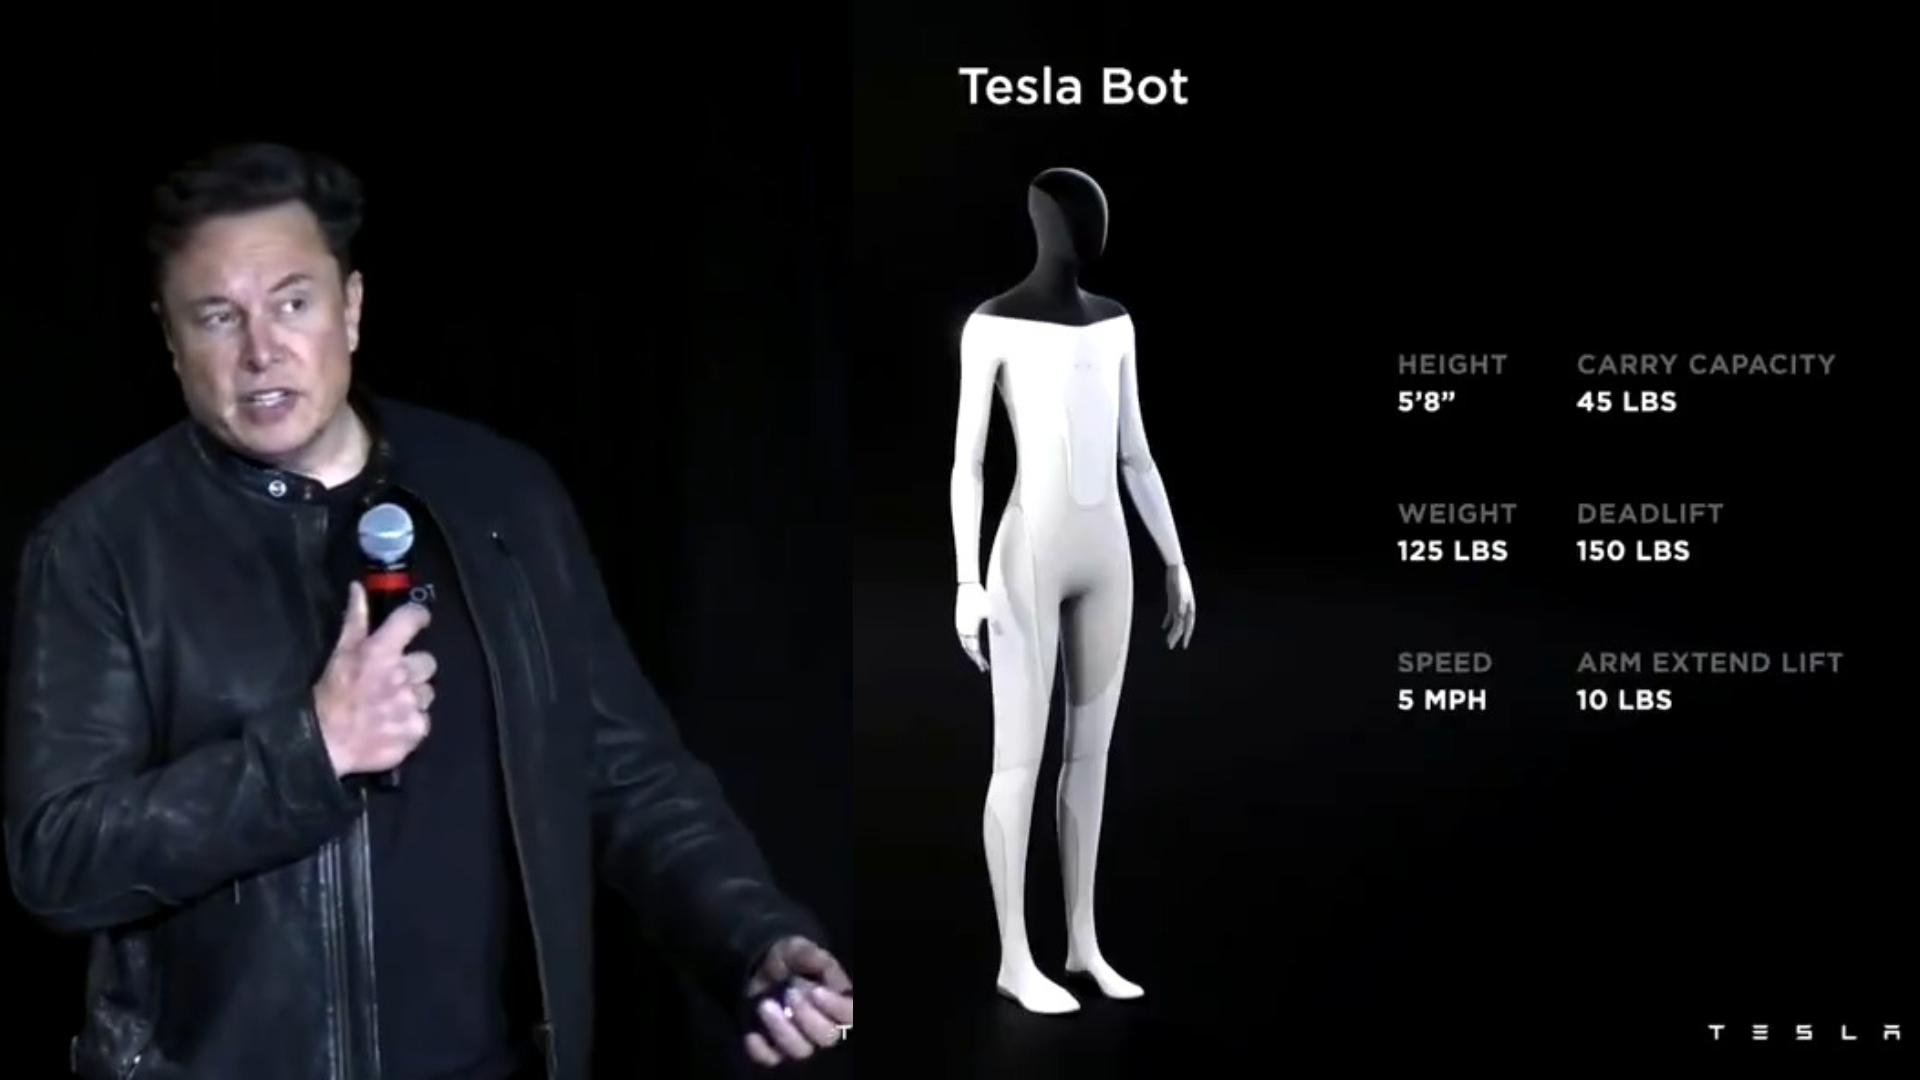 Elon Musk unveils an AI humanoid Robot